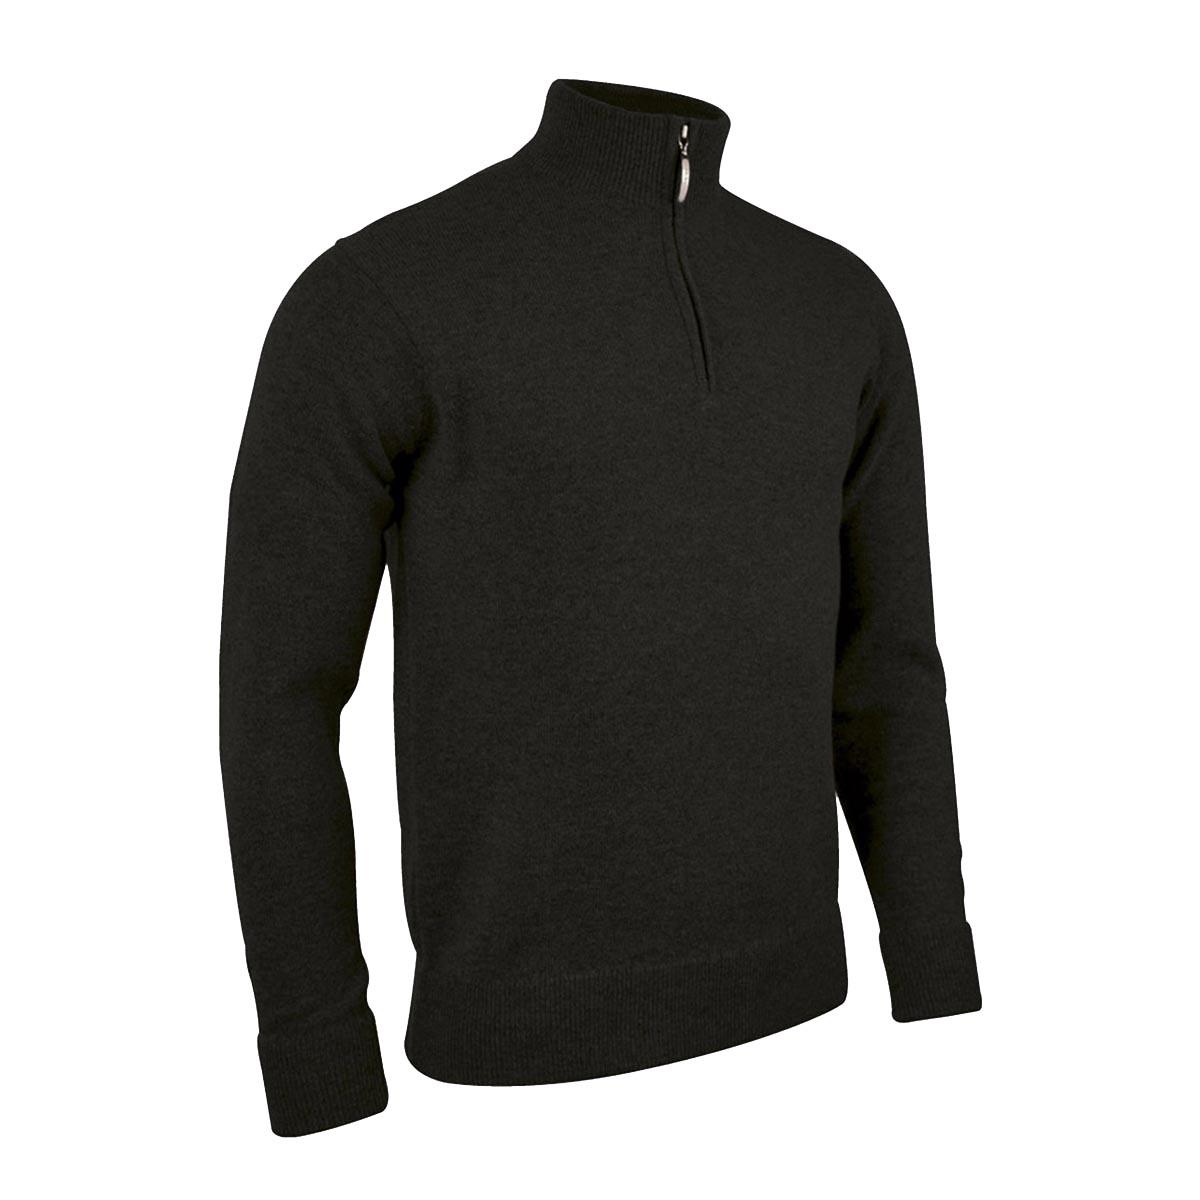 Glenmuir Oban - Lambswool 1/4 Zip Sweater / Sweatshirt (M) (Navy)